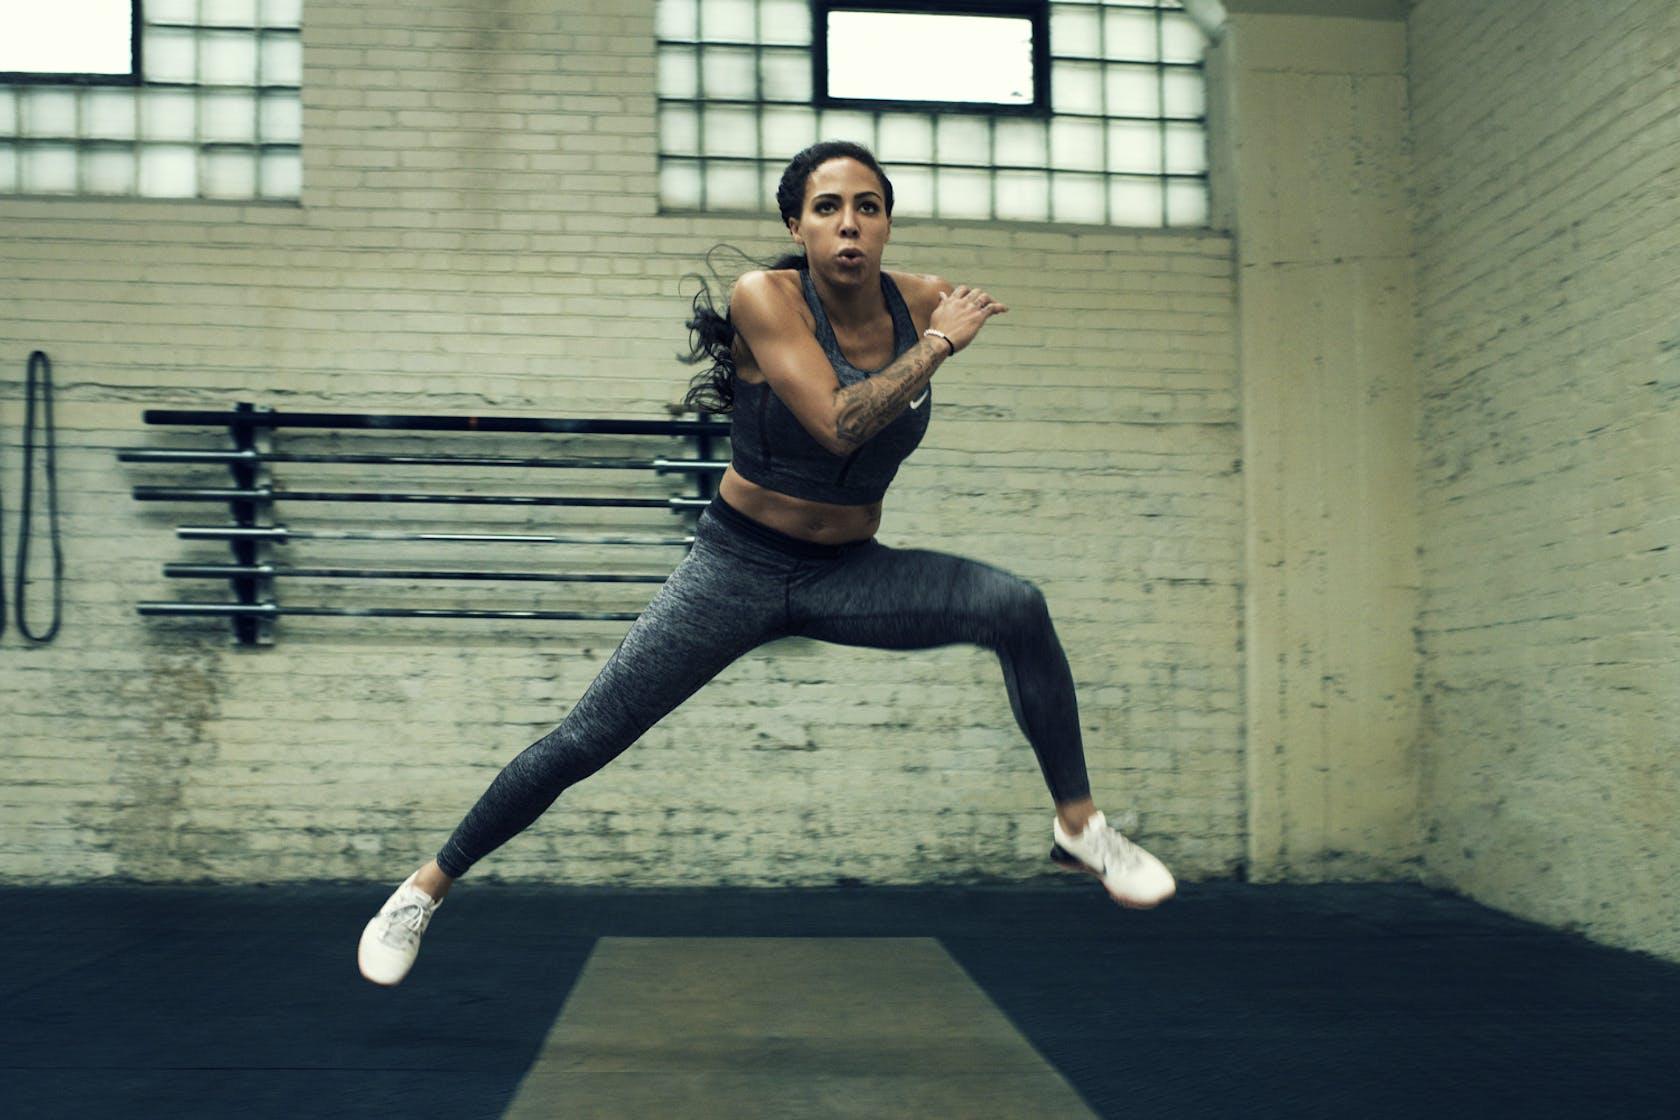 Nike Fitness